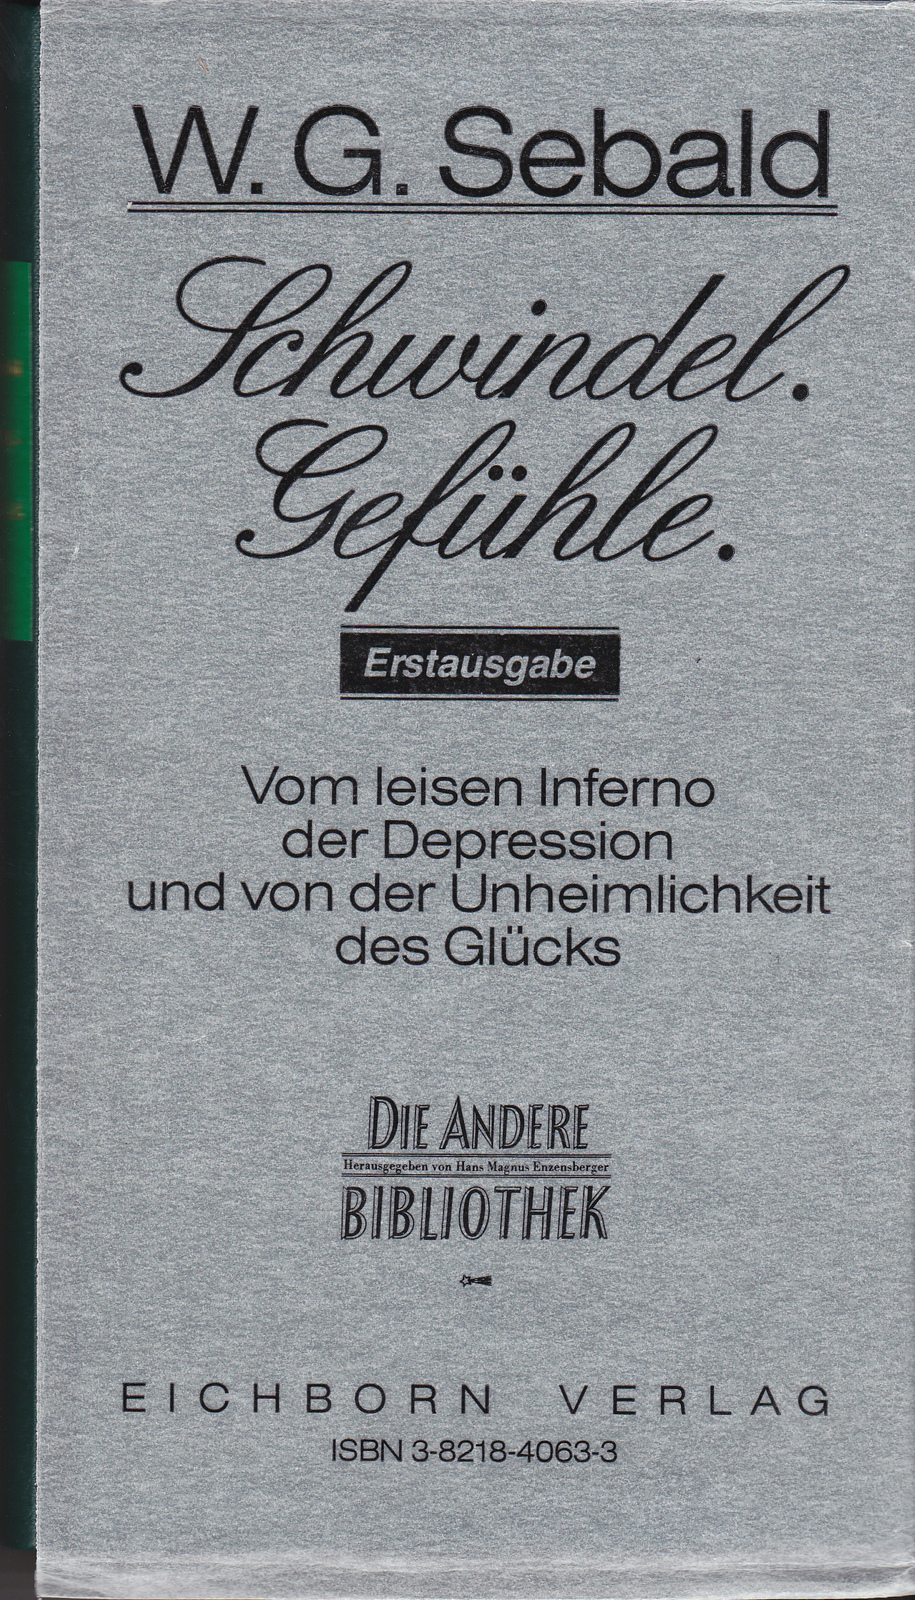 sebald-schwindel-gefuhle-with-cover